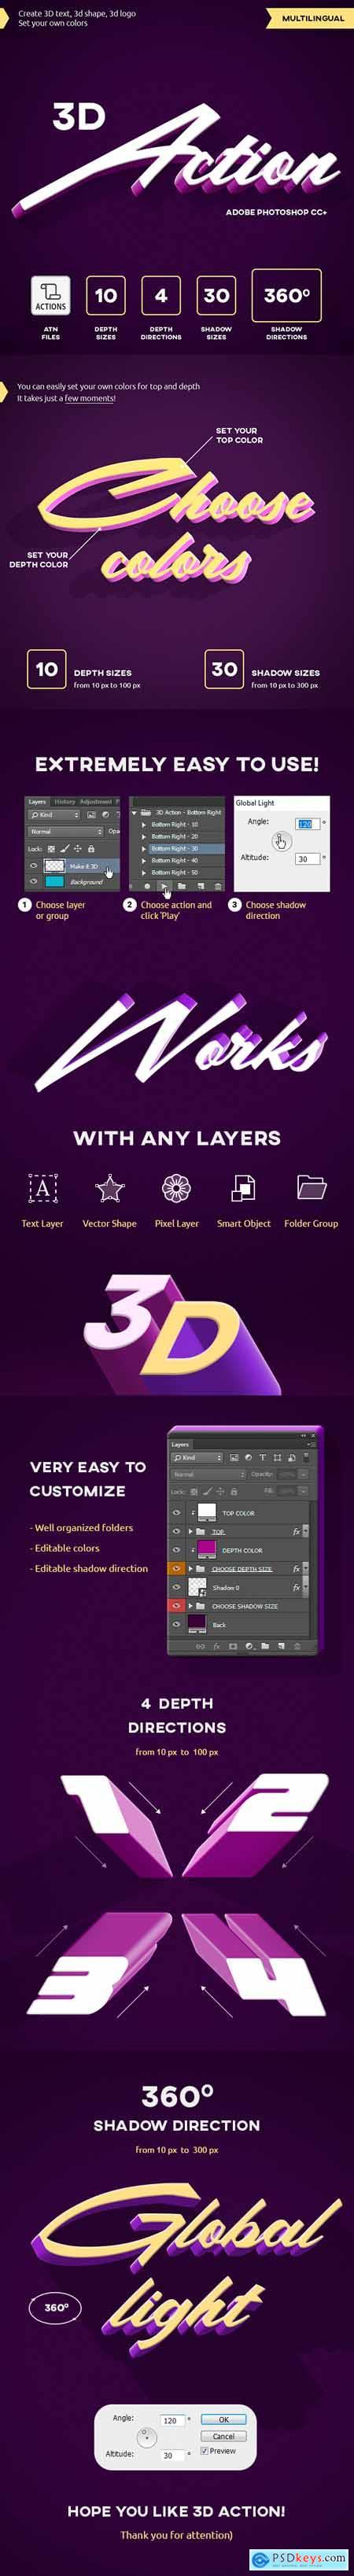 Graphicriver 3D Action